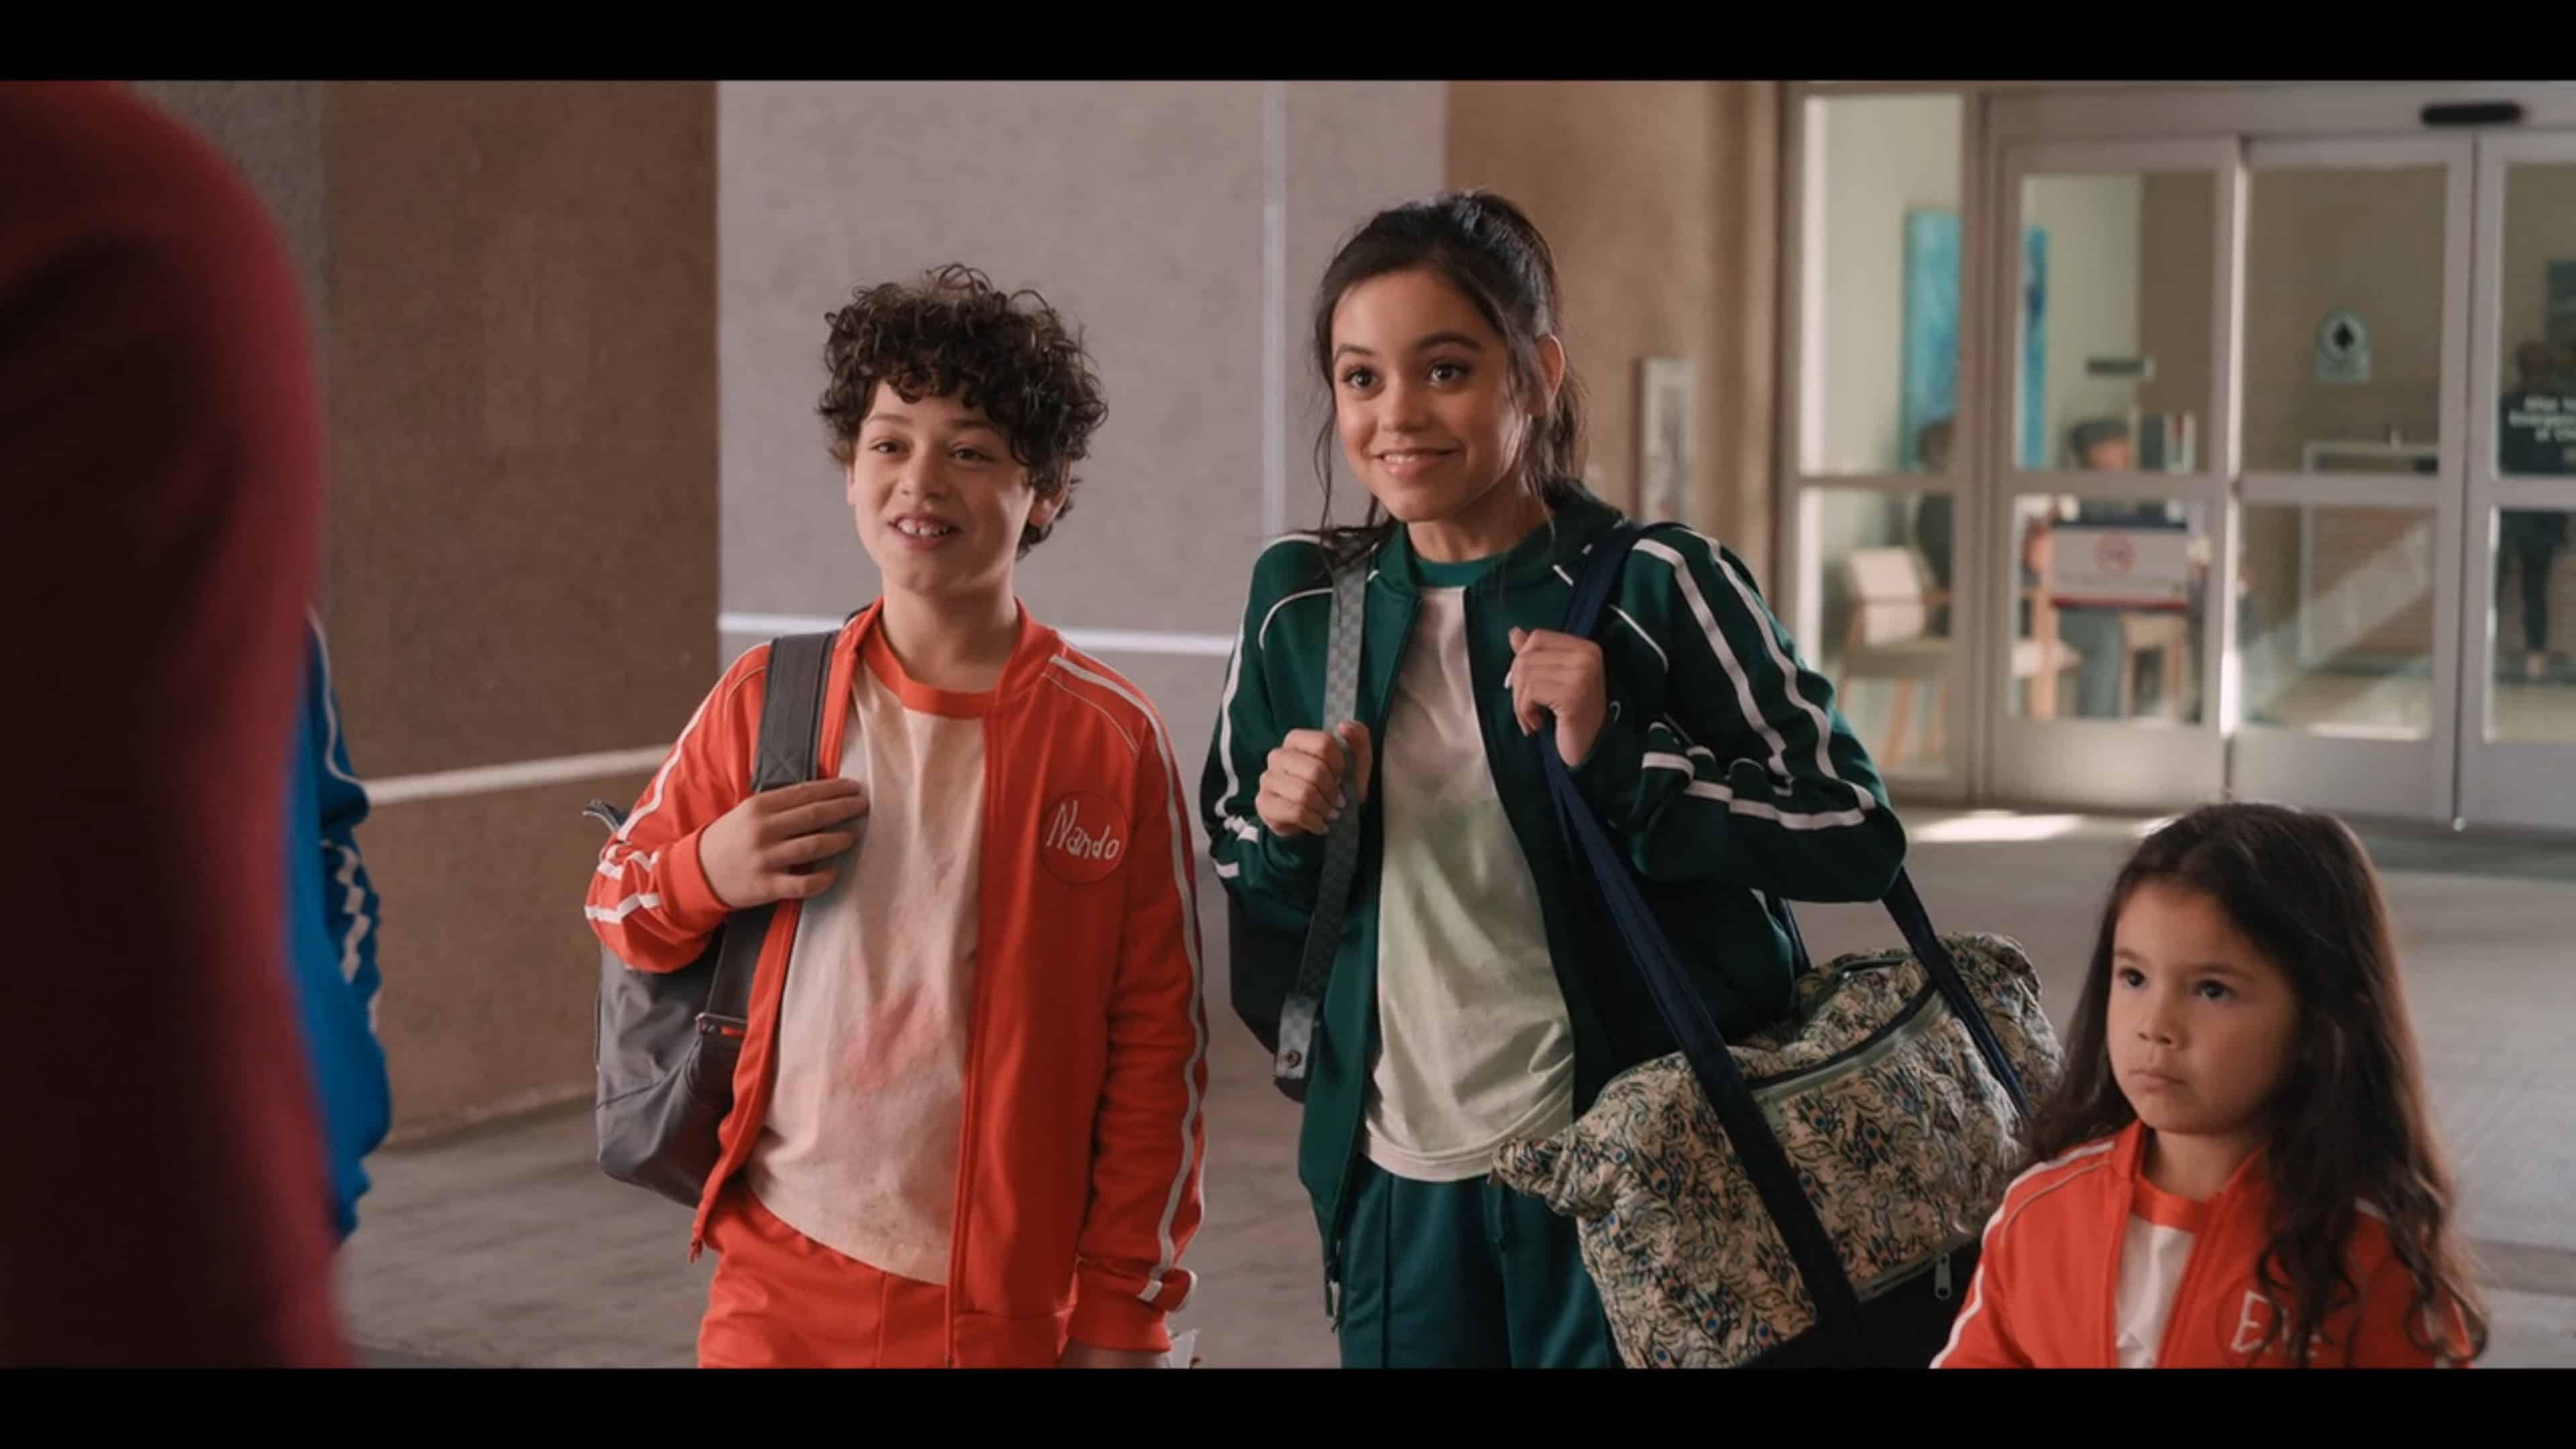 Nando (Julian Lerner), Katie (Jenna Ortega), Ellie (Everly Carganilla) excited for Yes Day